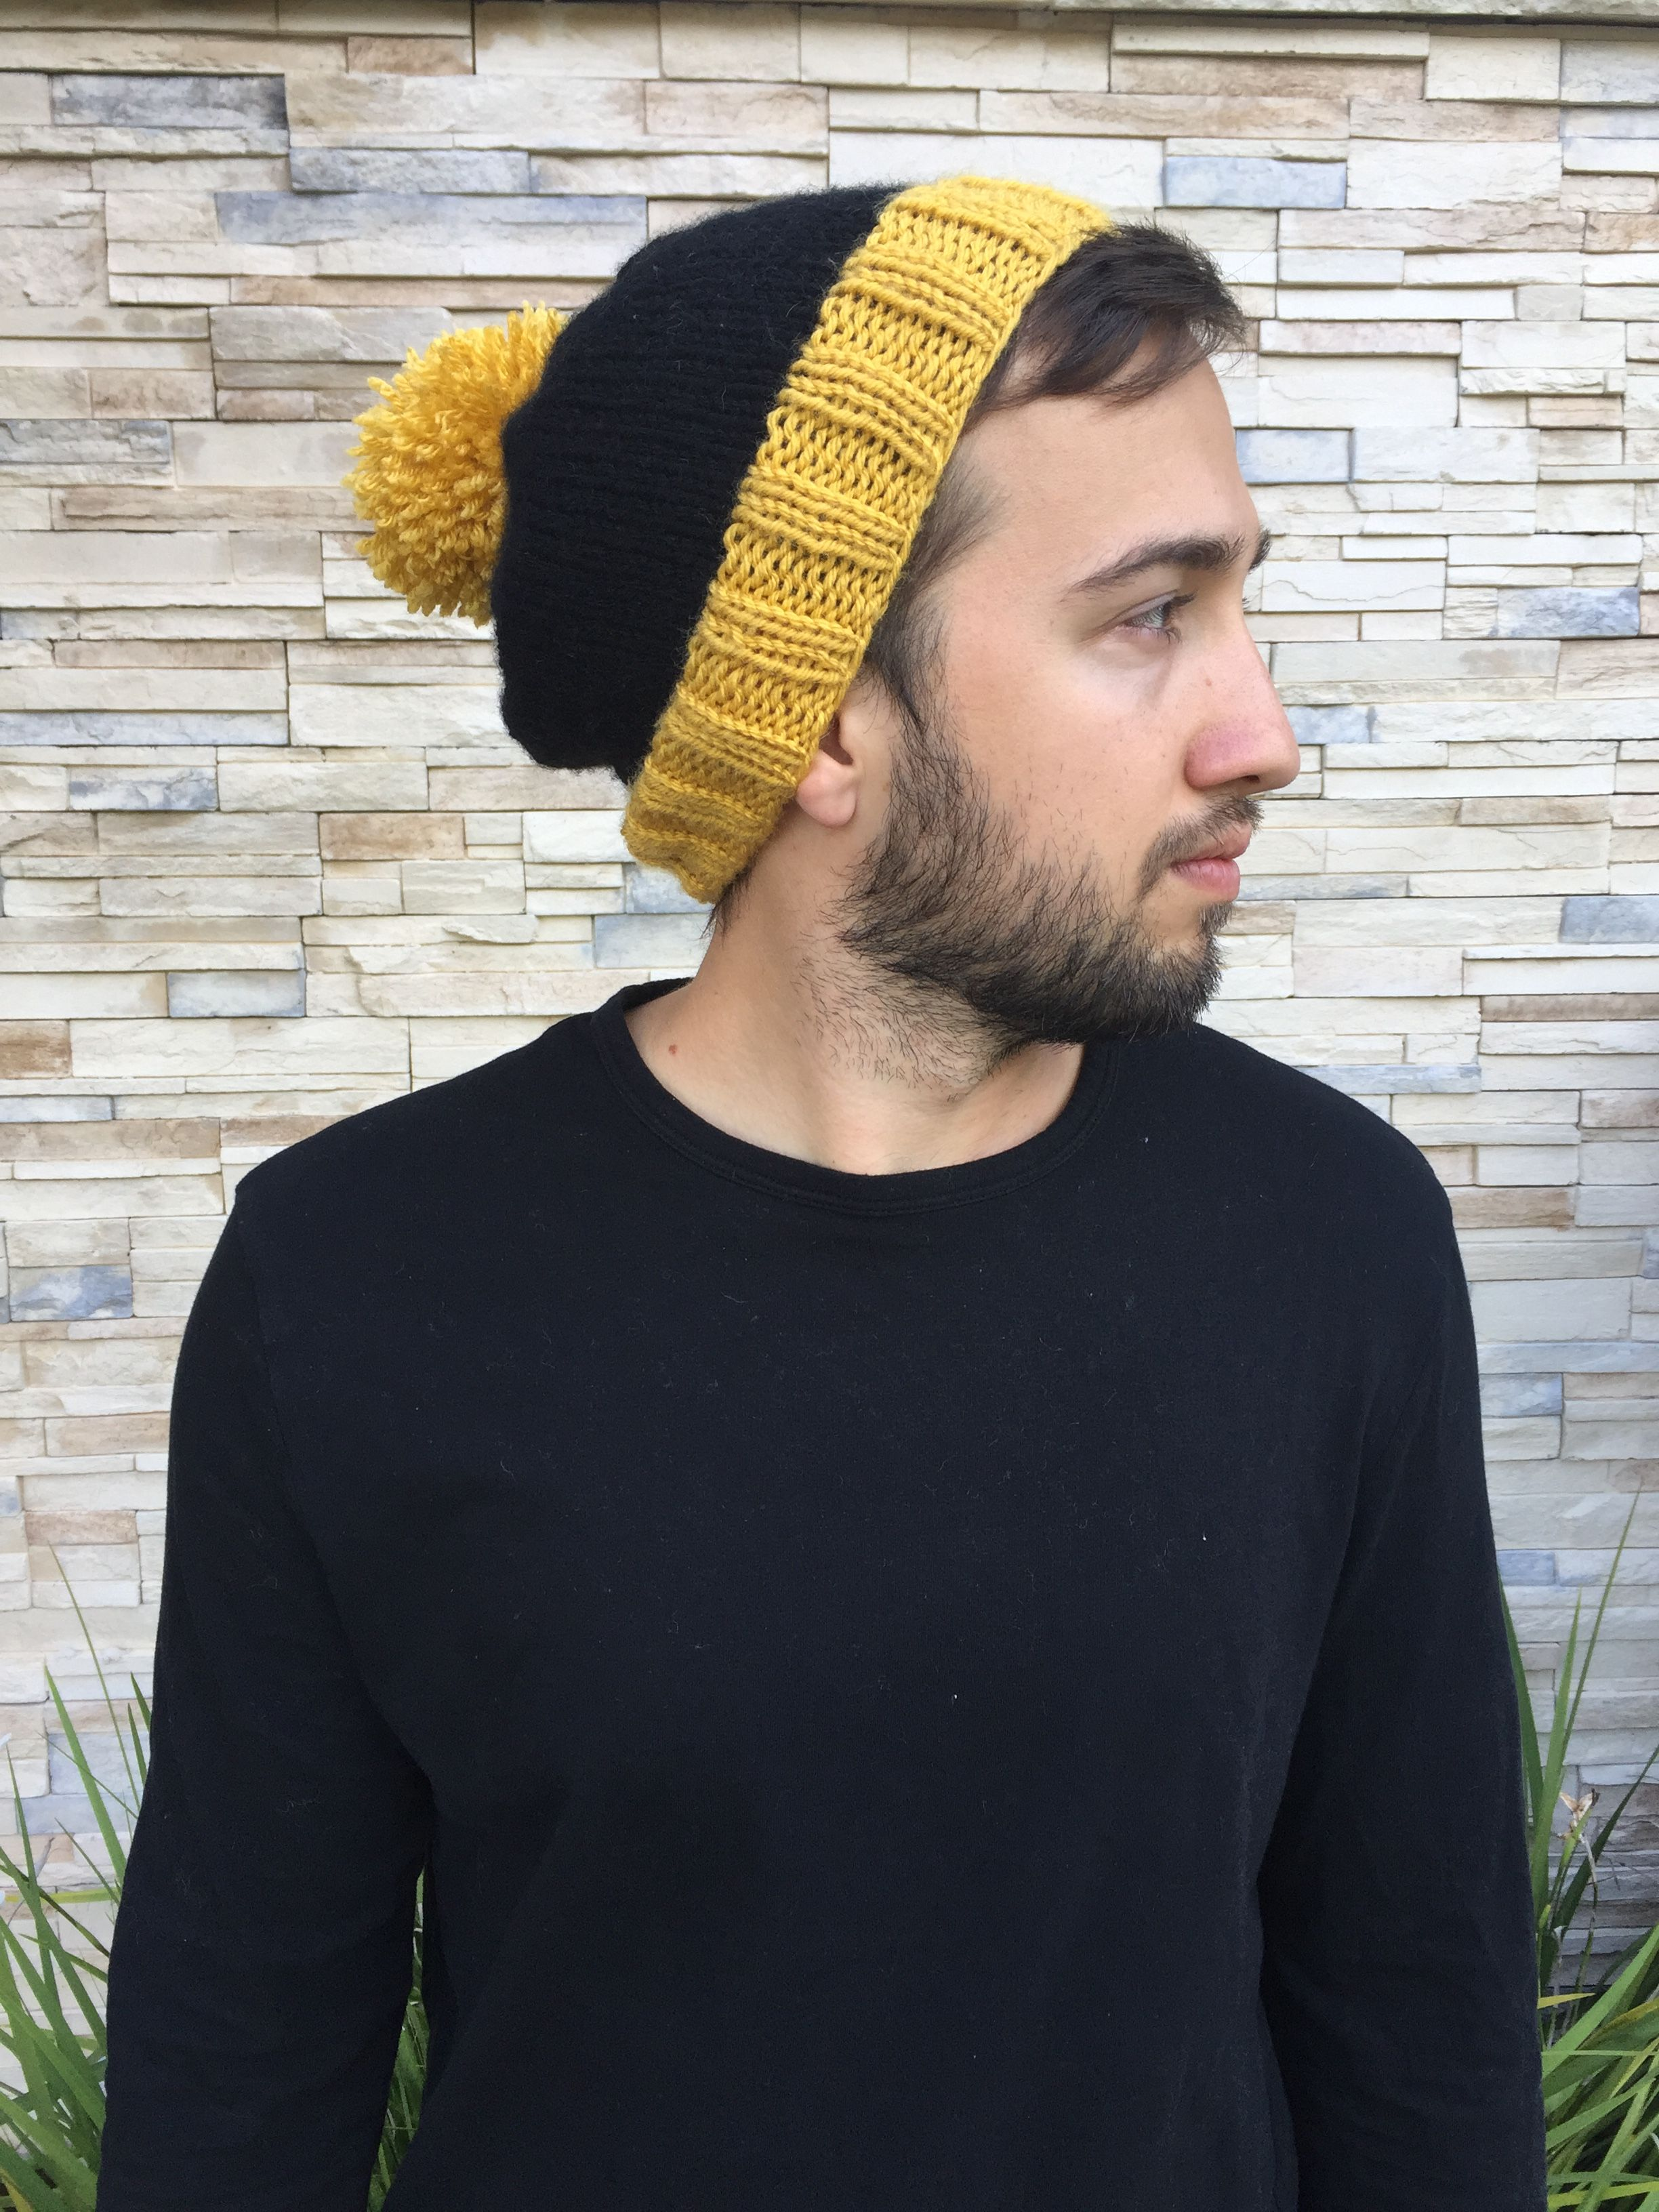 c2872fd74f1 Collegiate Rib Brim Beanie    Mustard Yellow   Black    Slouchy Hat ...